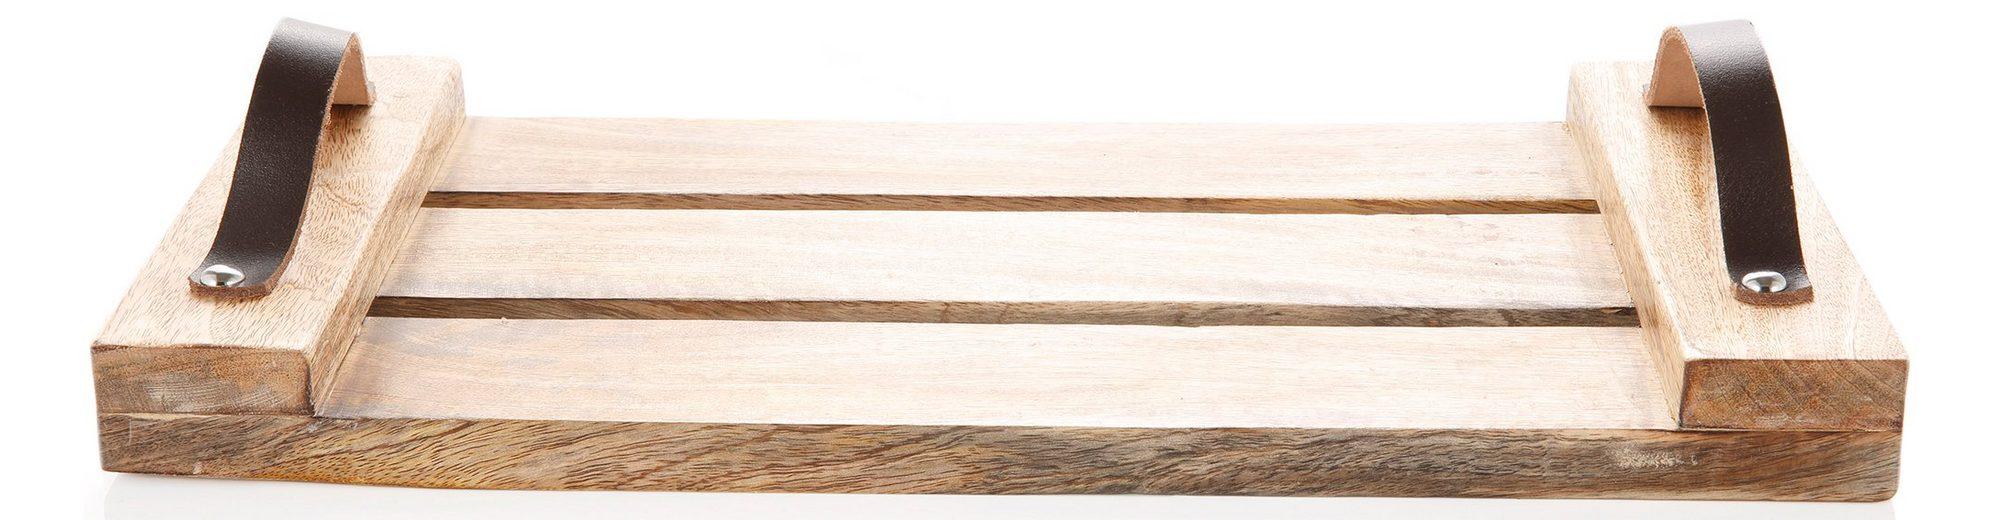 Deko-Tablett aus Holz